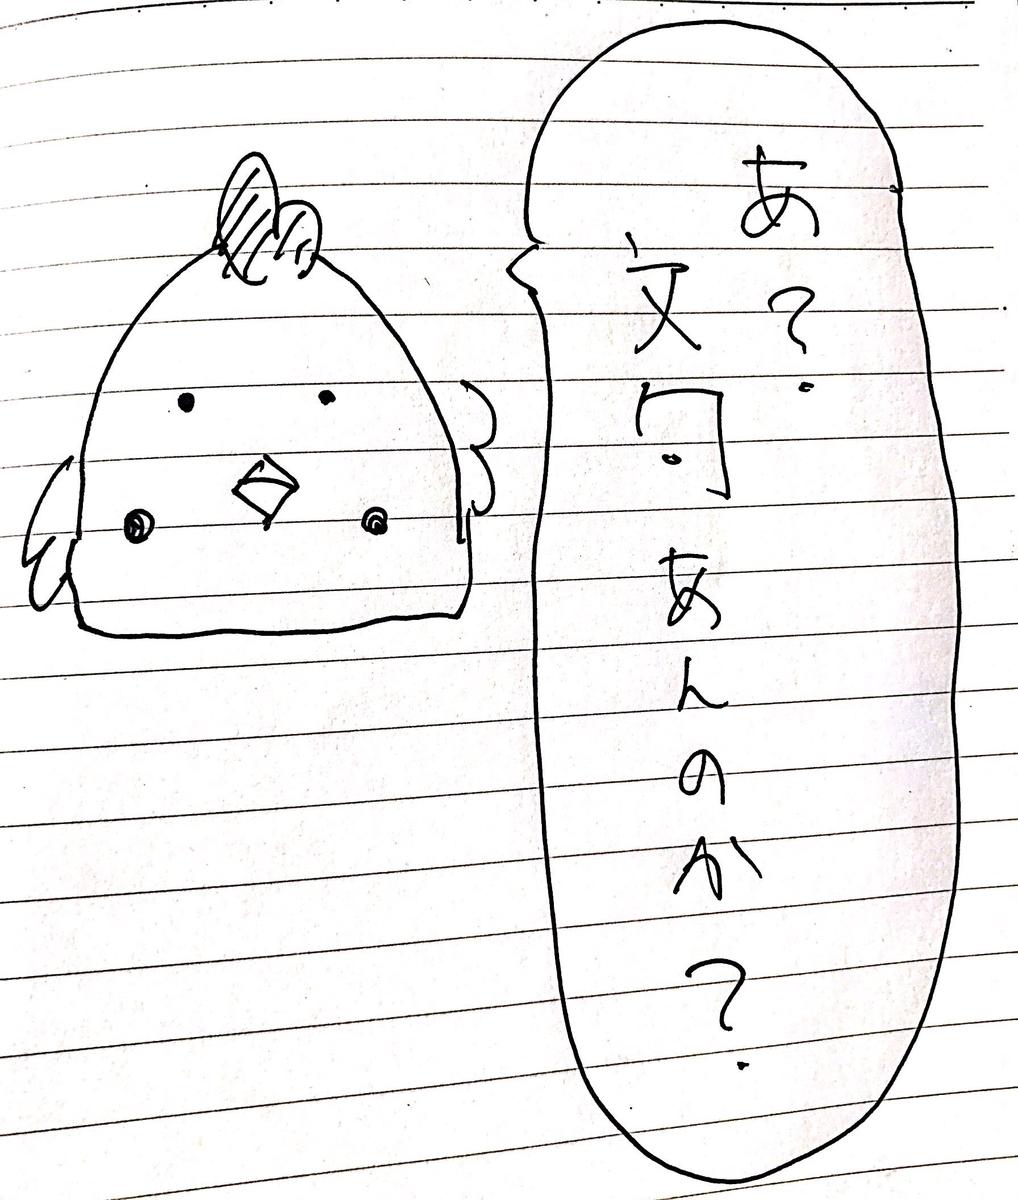 f:id:daigakuseino:20190524065211j:plain